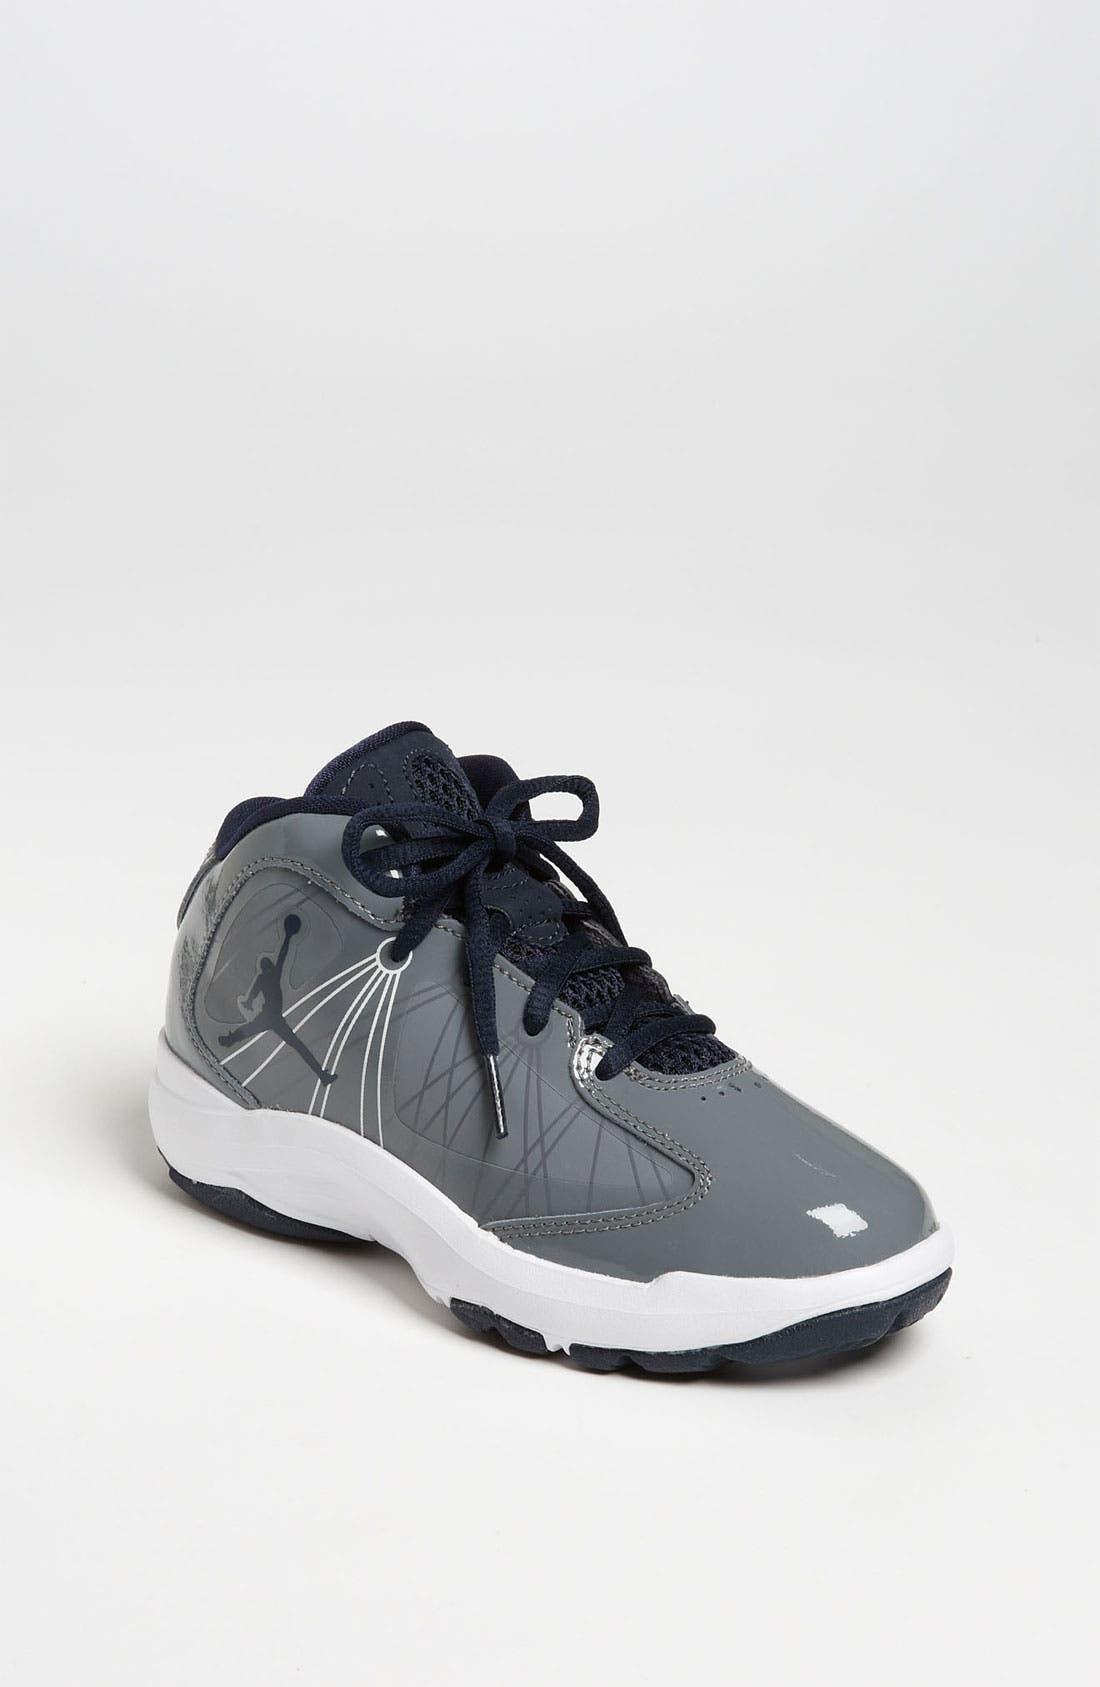 Alternate Image 1 Selected - Nike 'Jordan Aero Flight' Sneaker (Toddler & Little Kid)